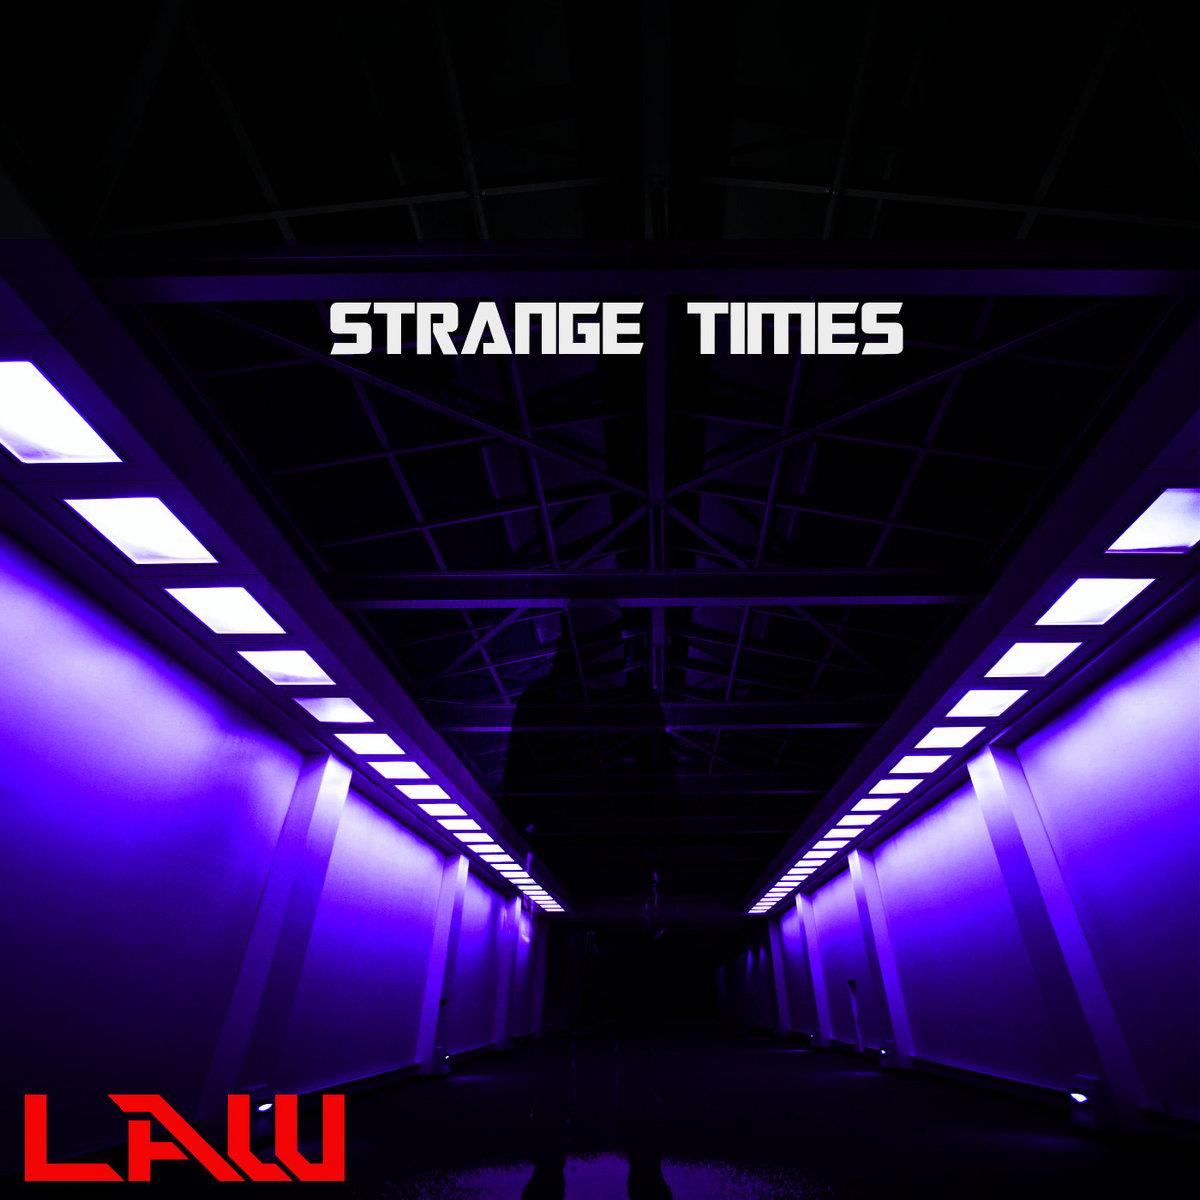 Strange Times by LAW